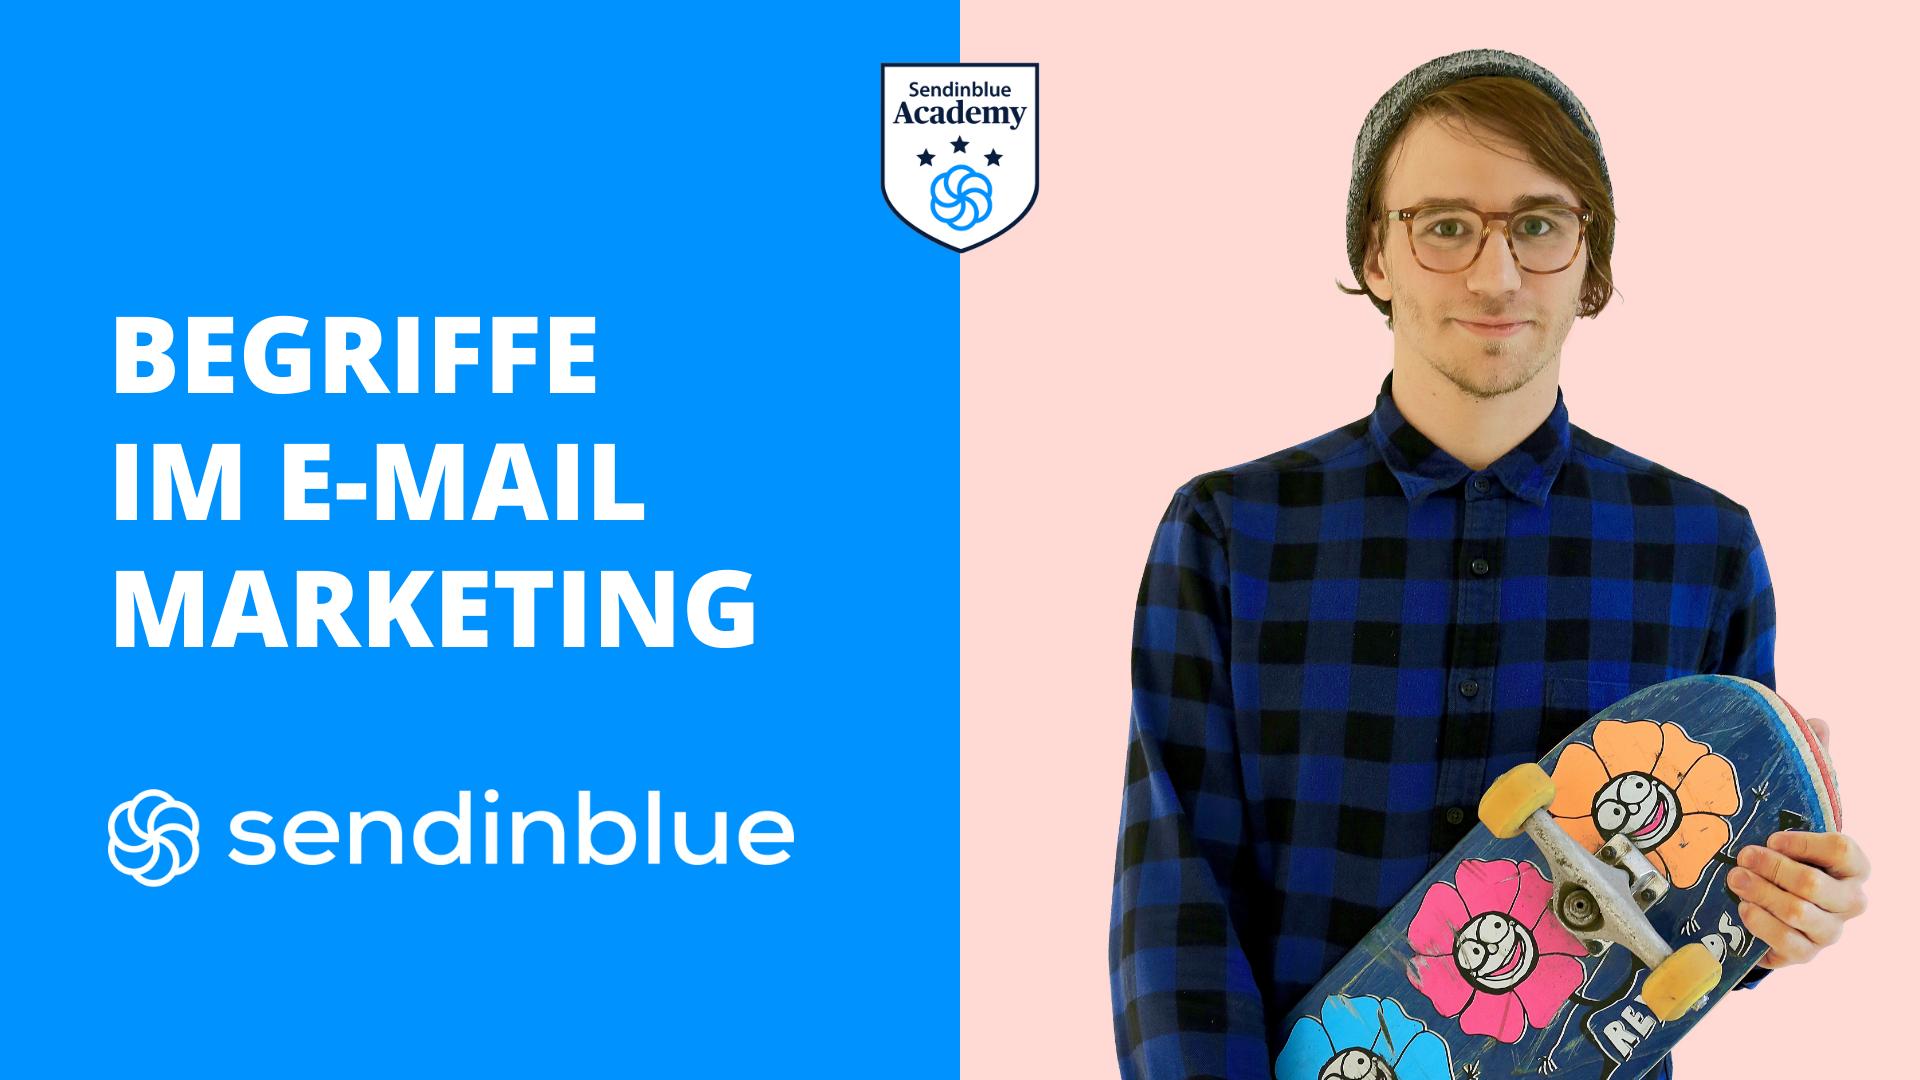 Begriffe im E-Mail Marketing - Sendinblue Academy - Email Marketing Kurs